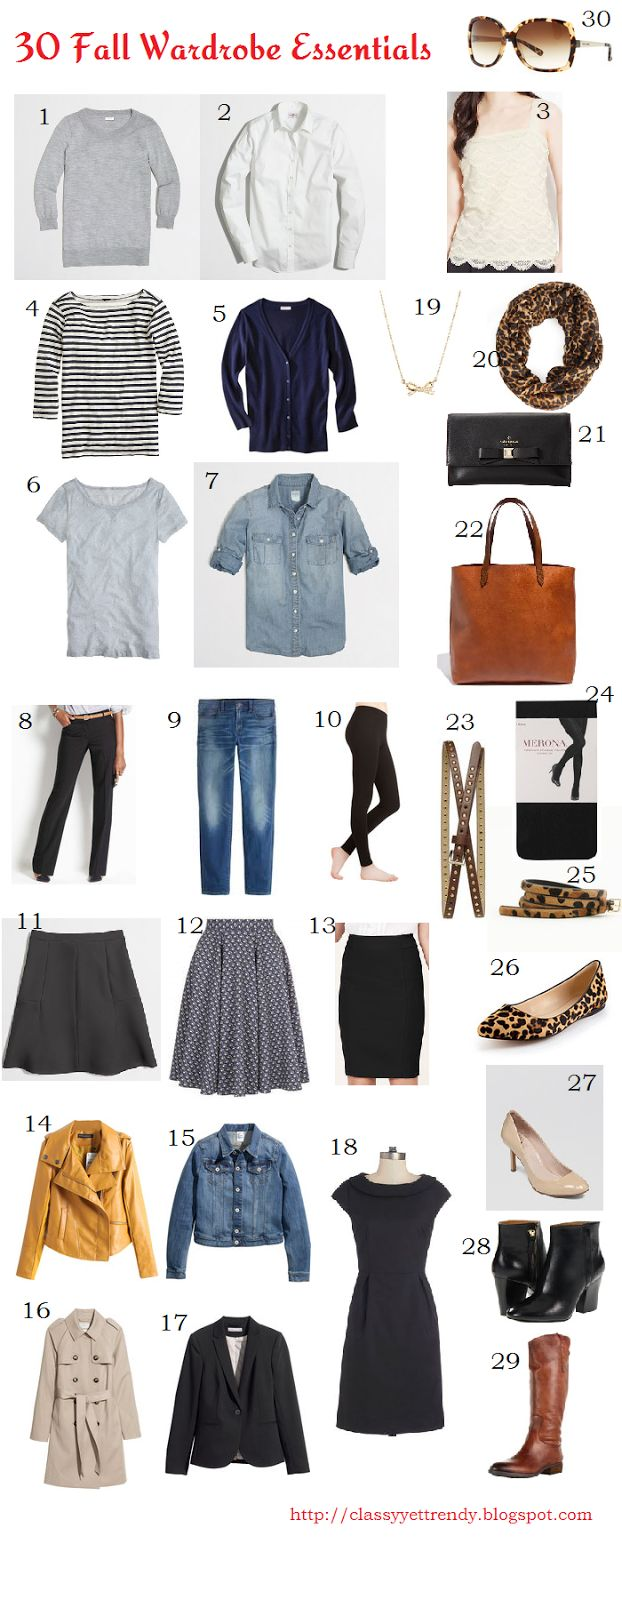 Classy Yet Trendy: 30 Fall Wardrobe Essentials